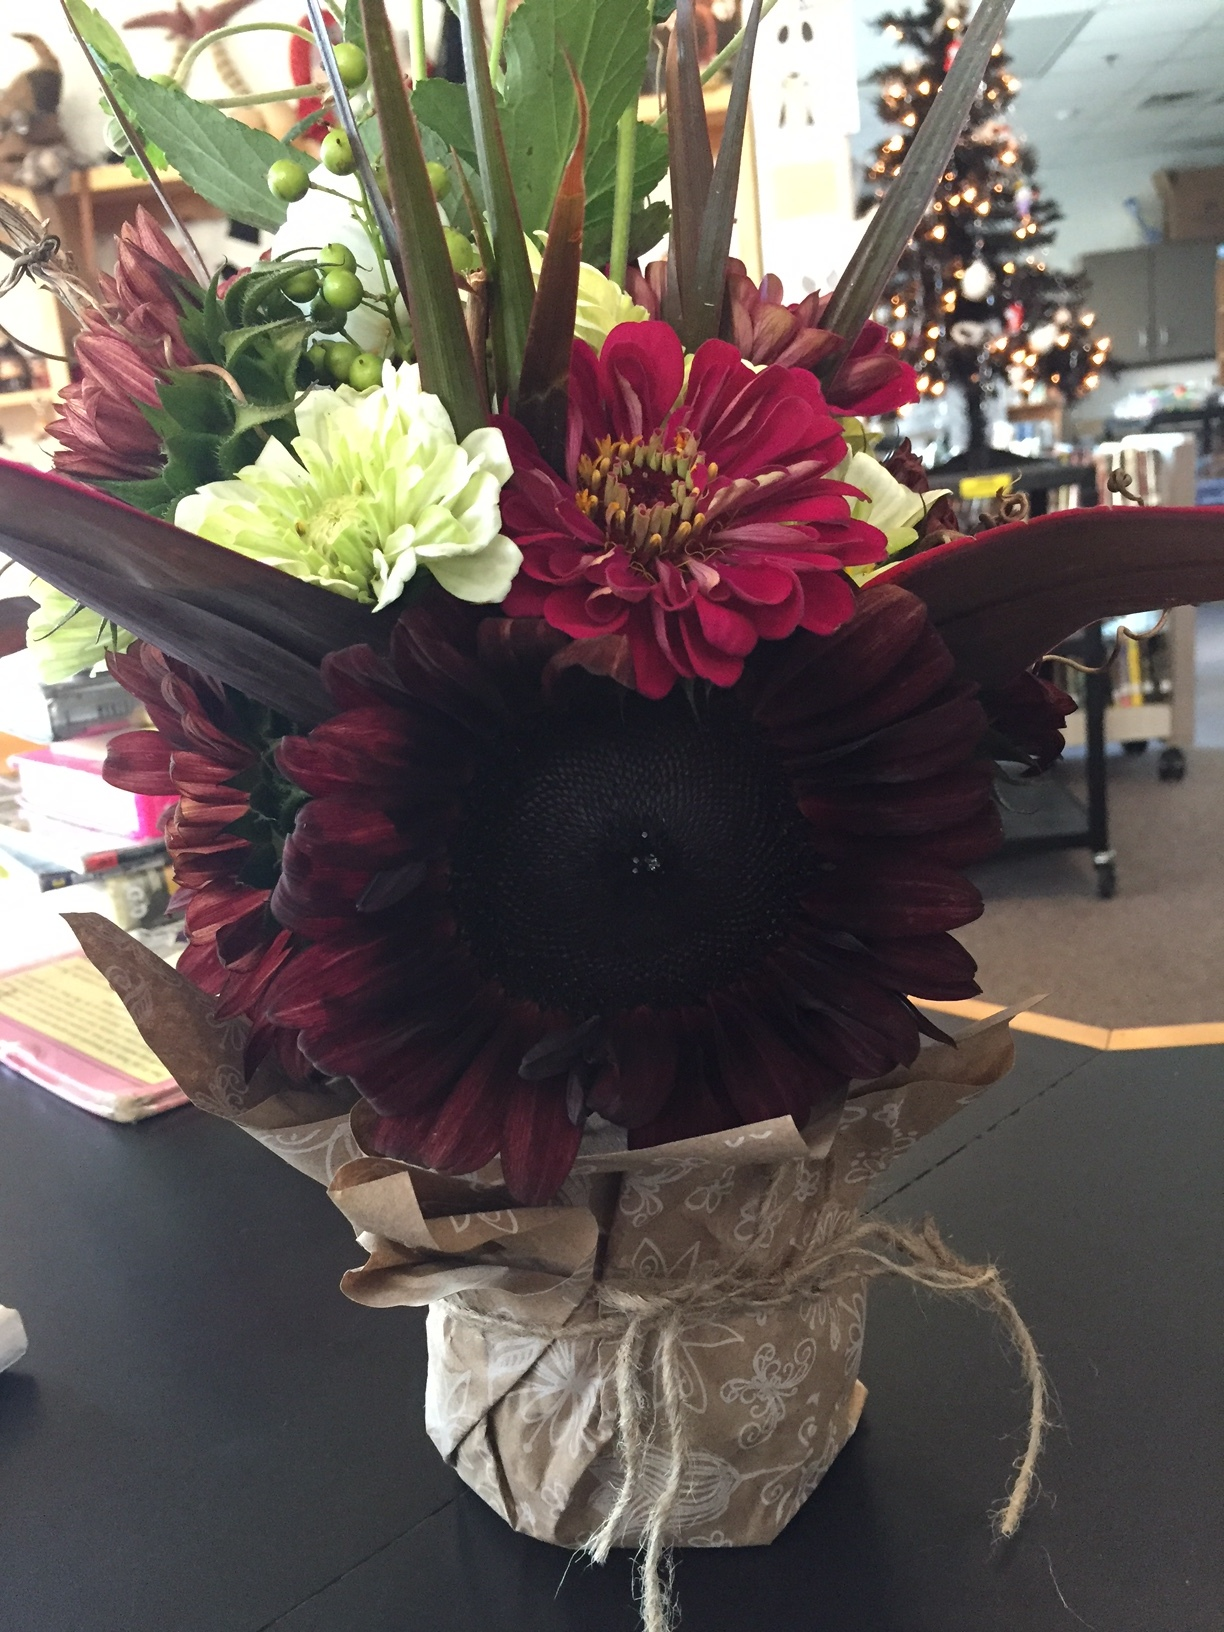 Chocolate Sunflowers